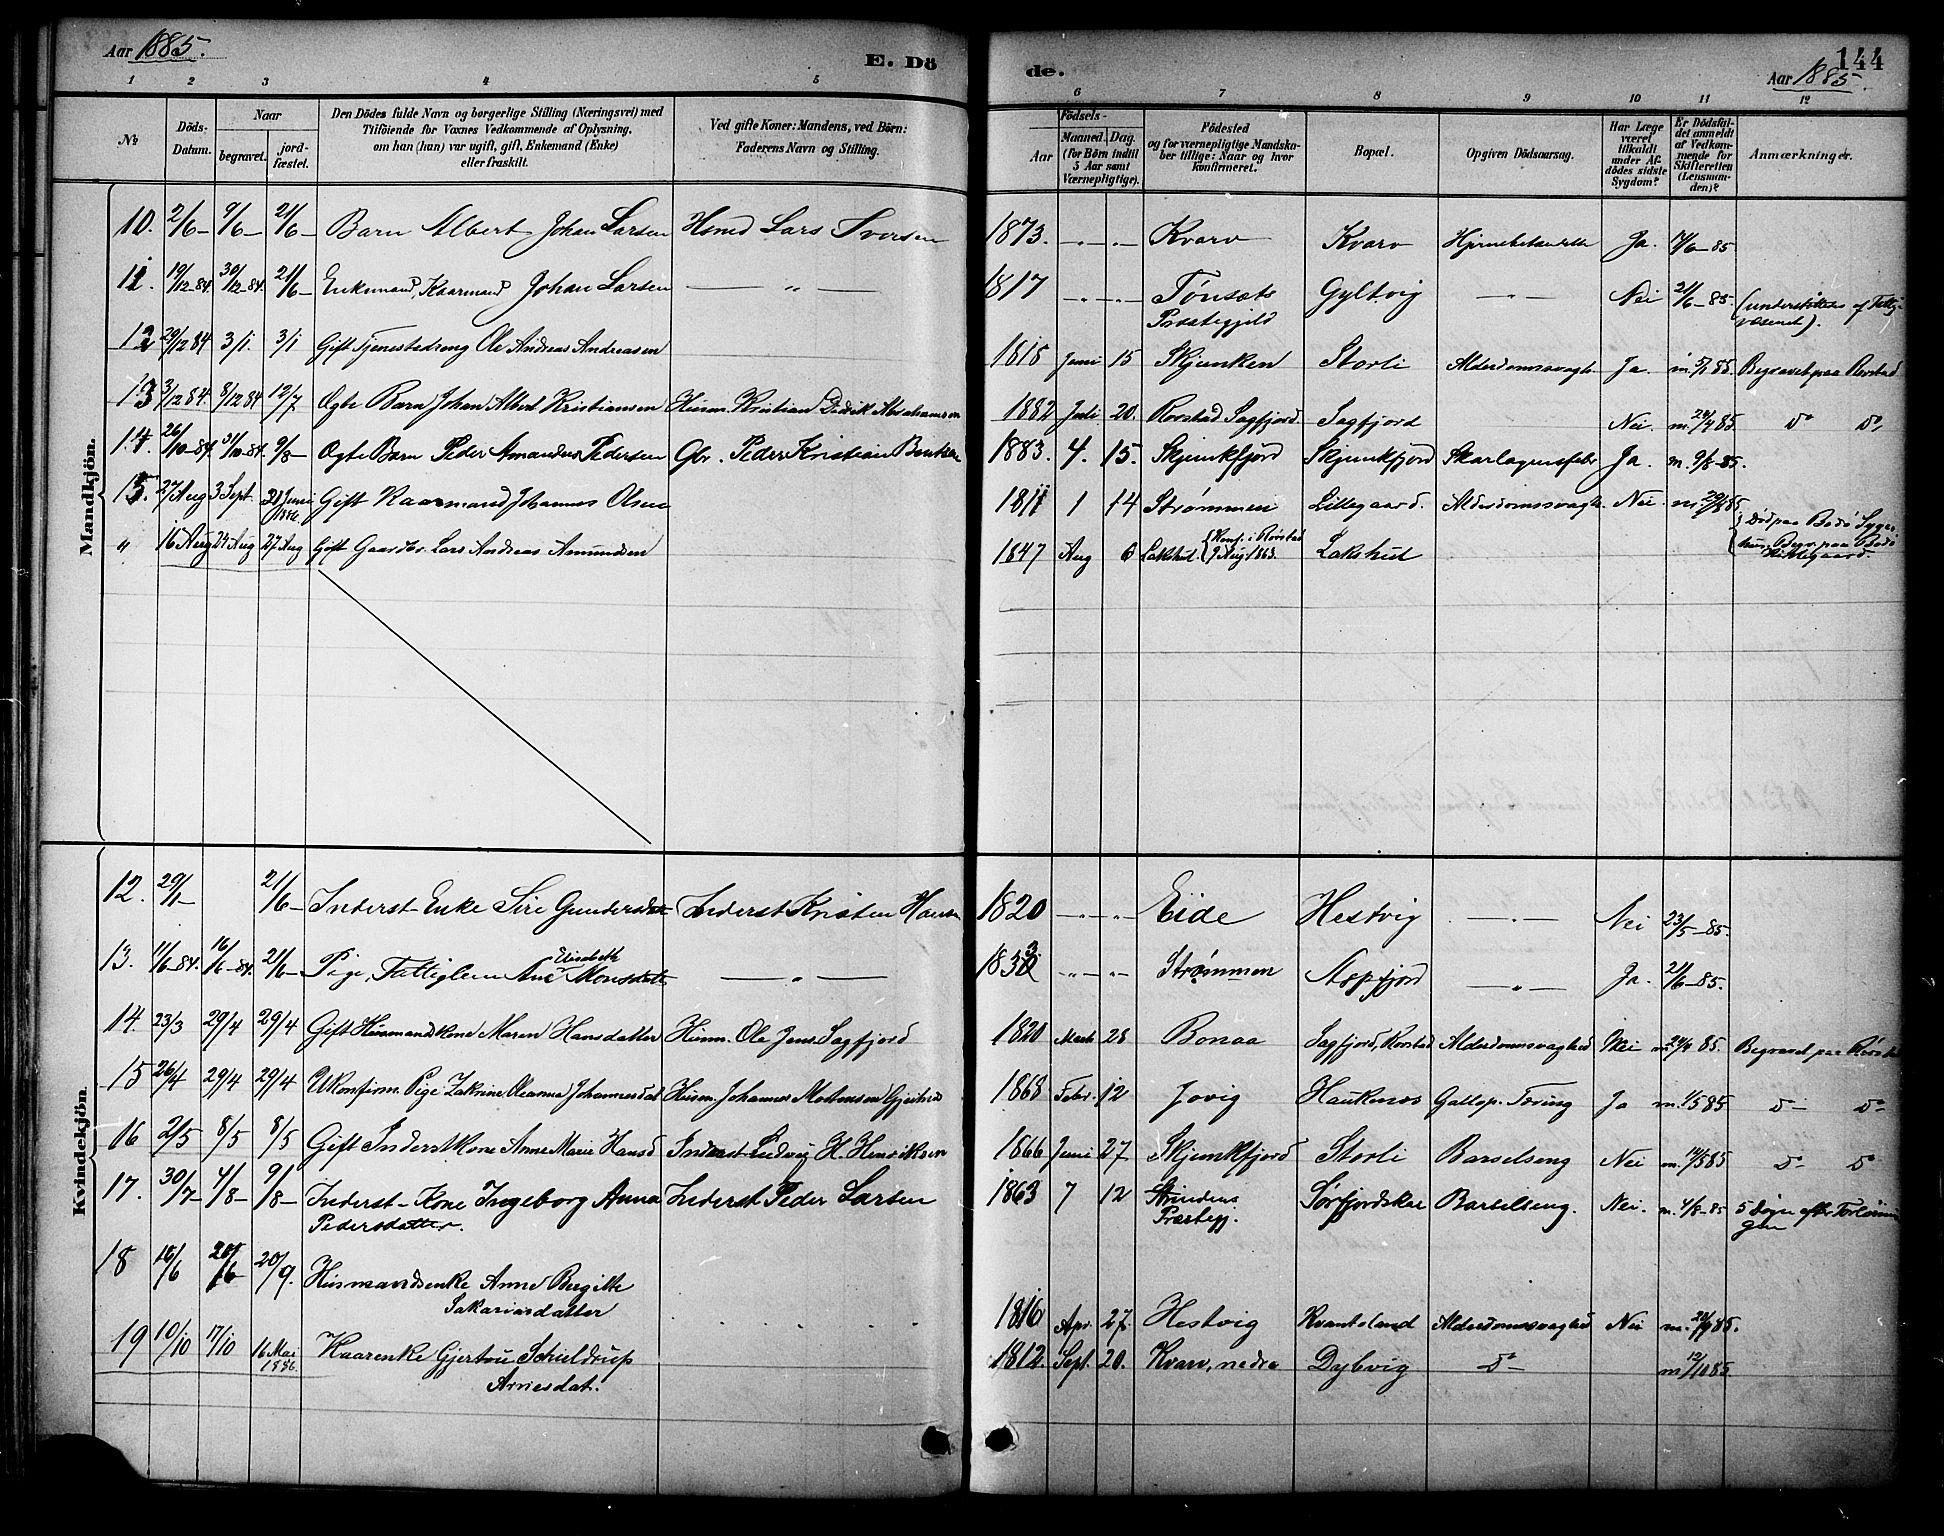 SAT, Ministerialprotokoller, klokkerbøker og fødselsregistre - Nordland, 854/L0777: Ministerialbok nr. 854A01 /1, 1883-1891, s. 144